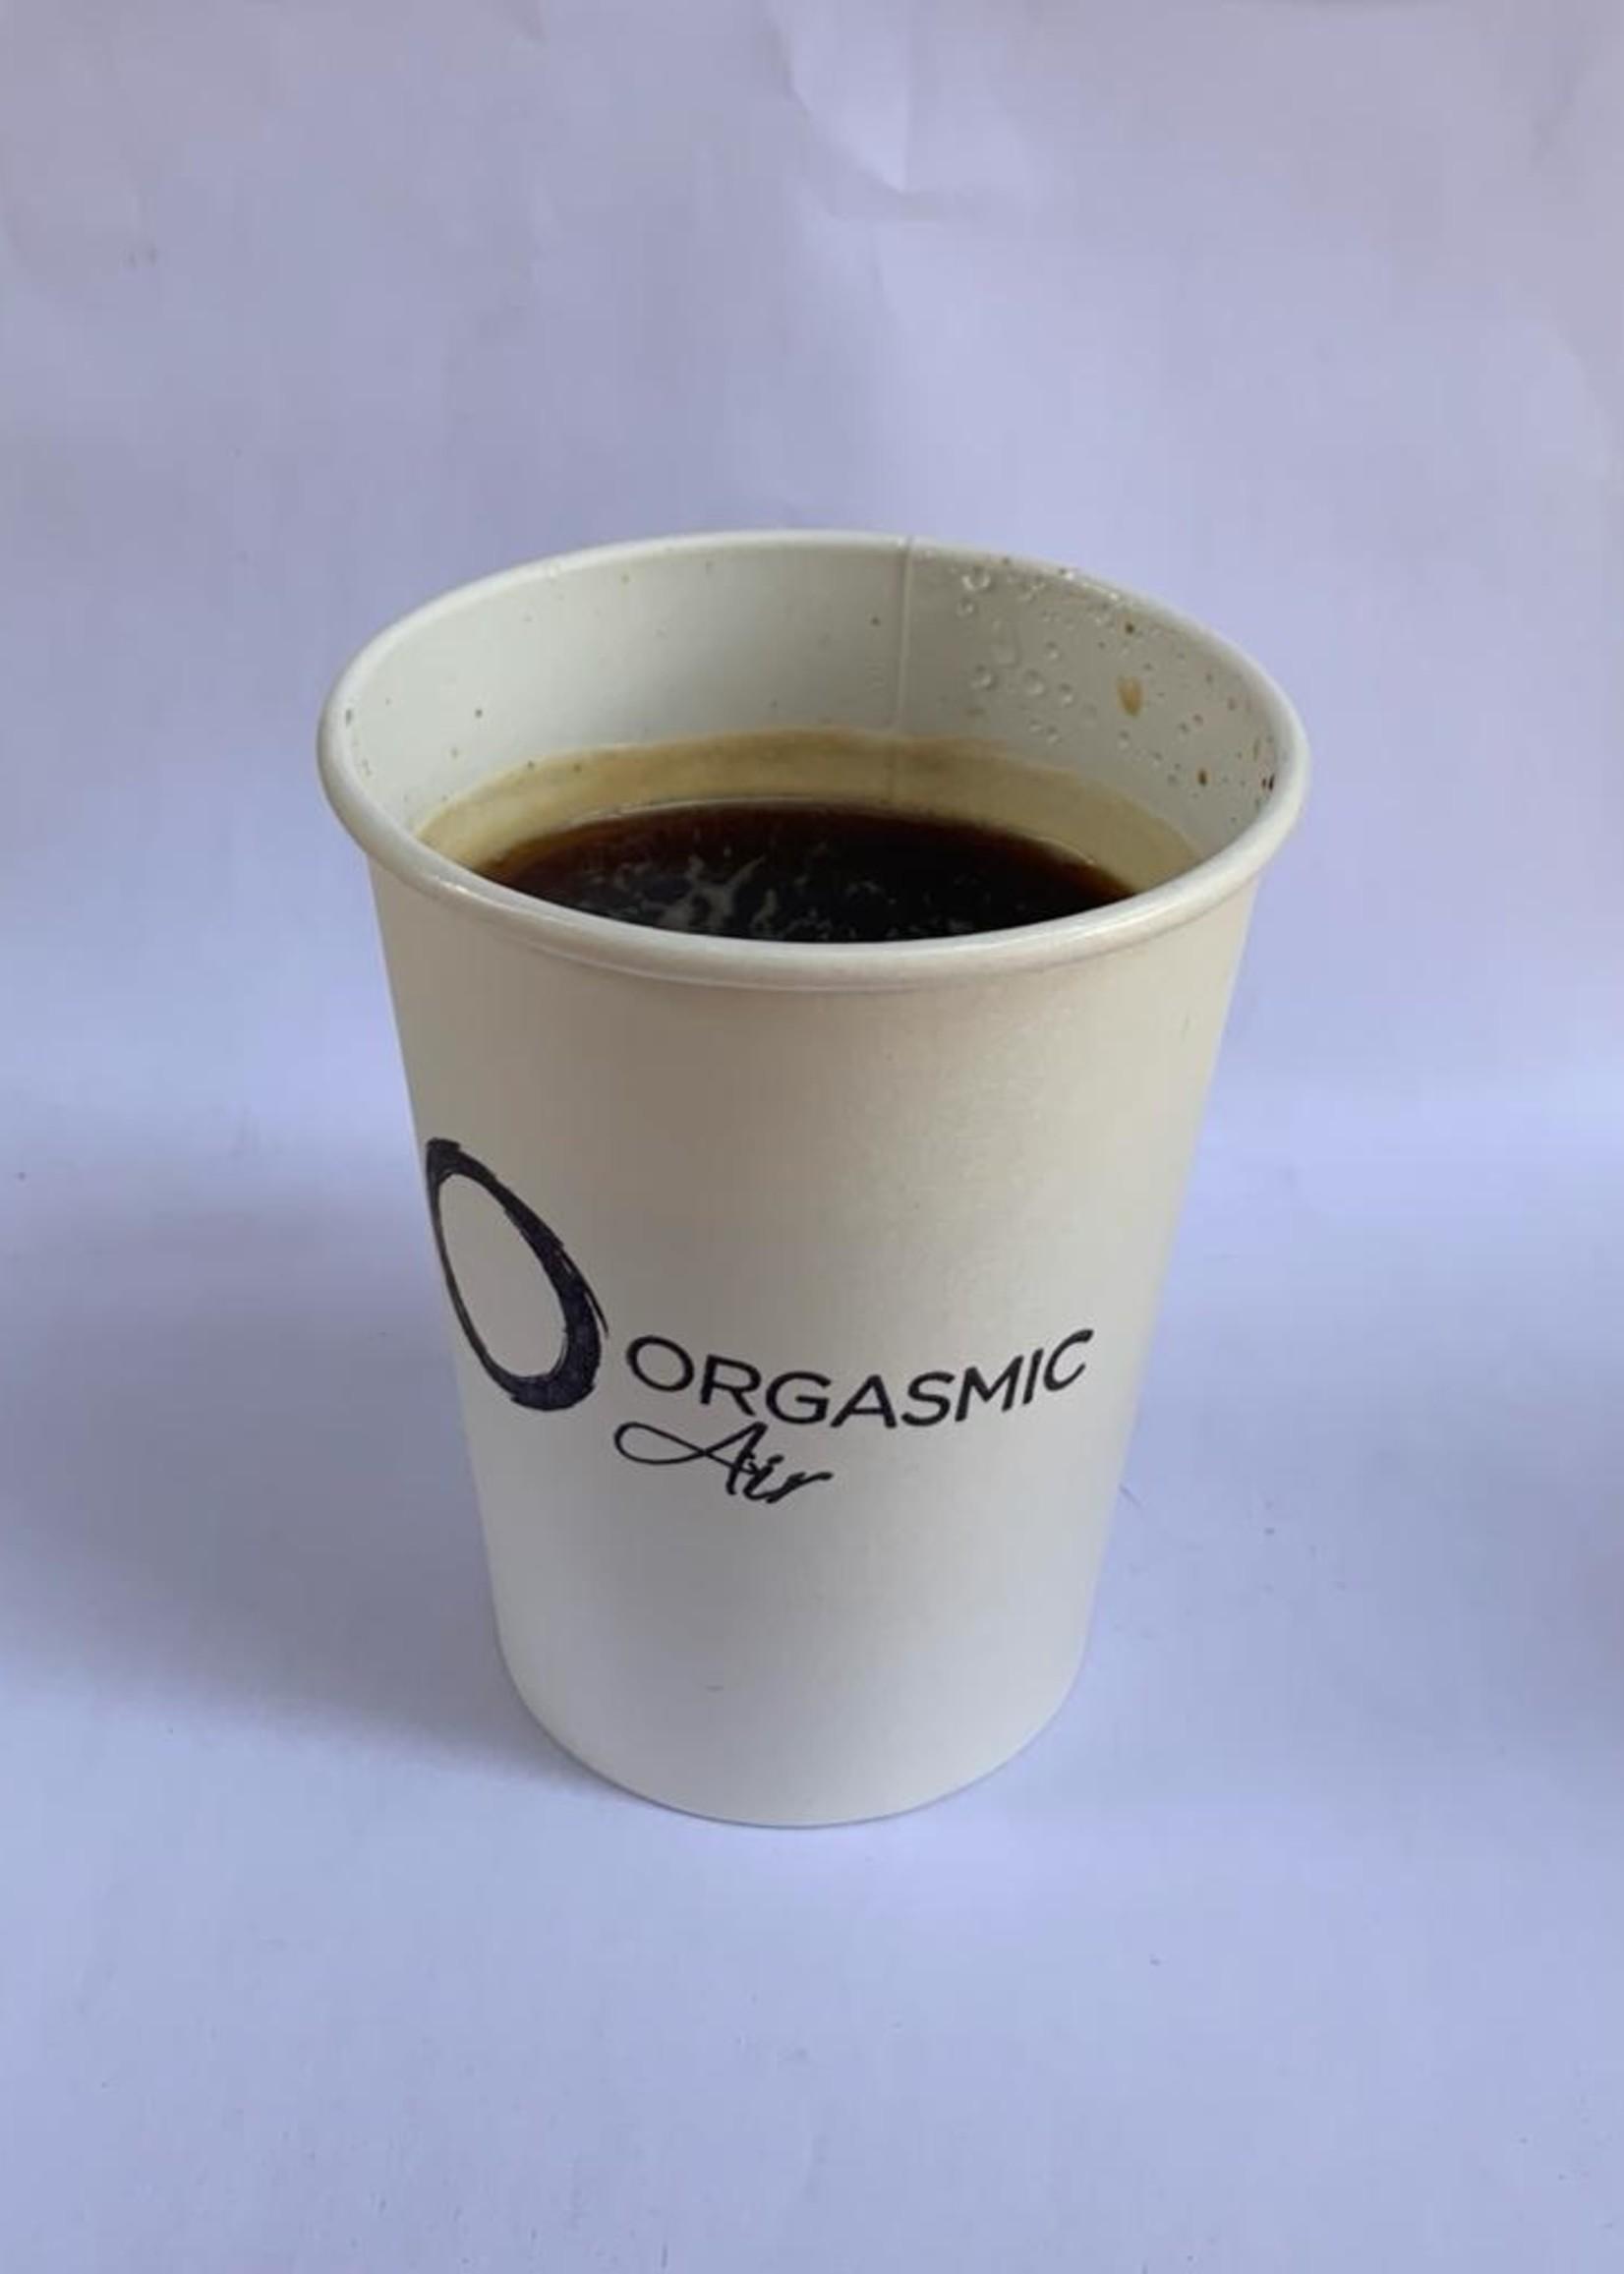 Organic & Air CBD infused americano